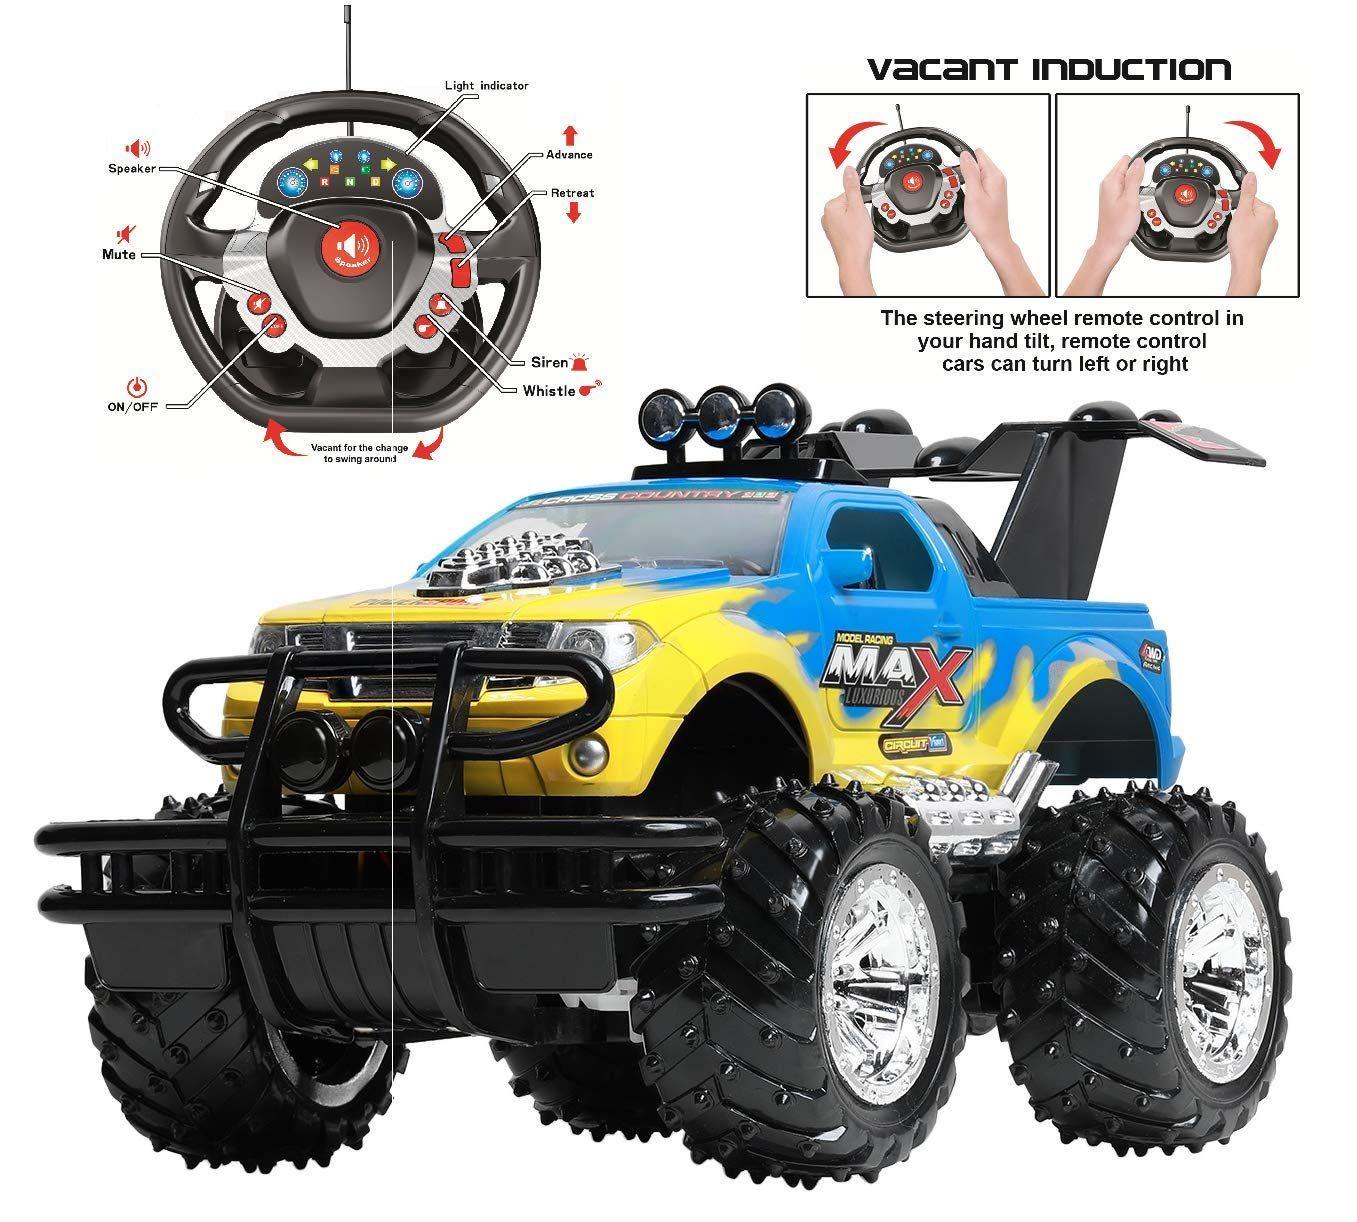 SHRAGIS Remote Control car | Remote control toys | Remote